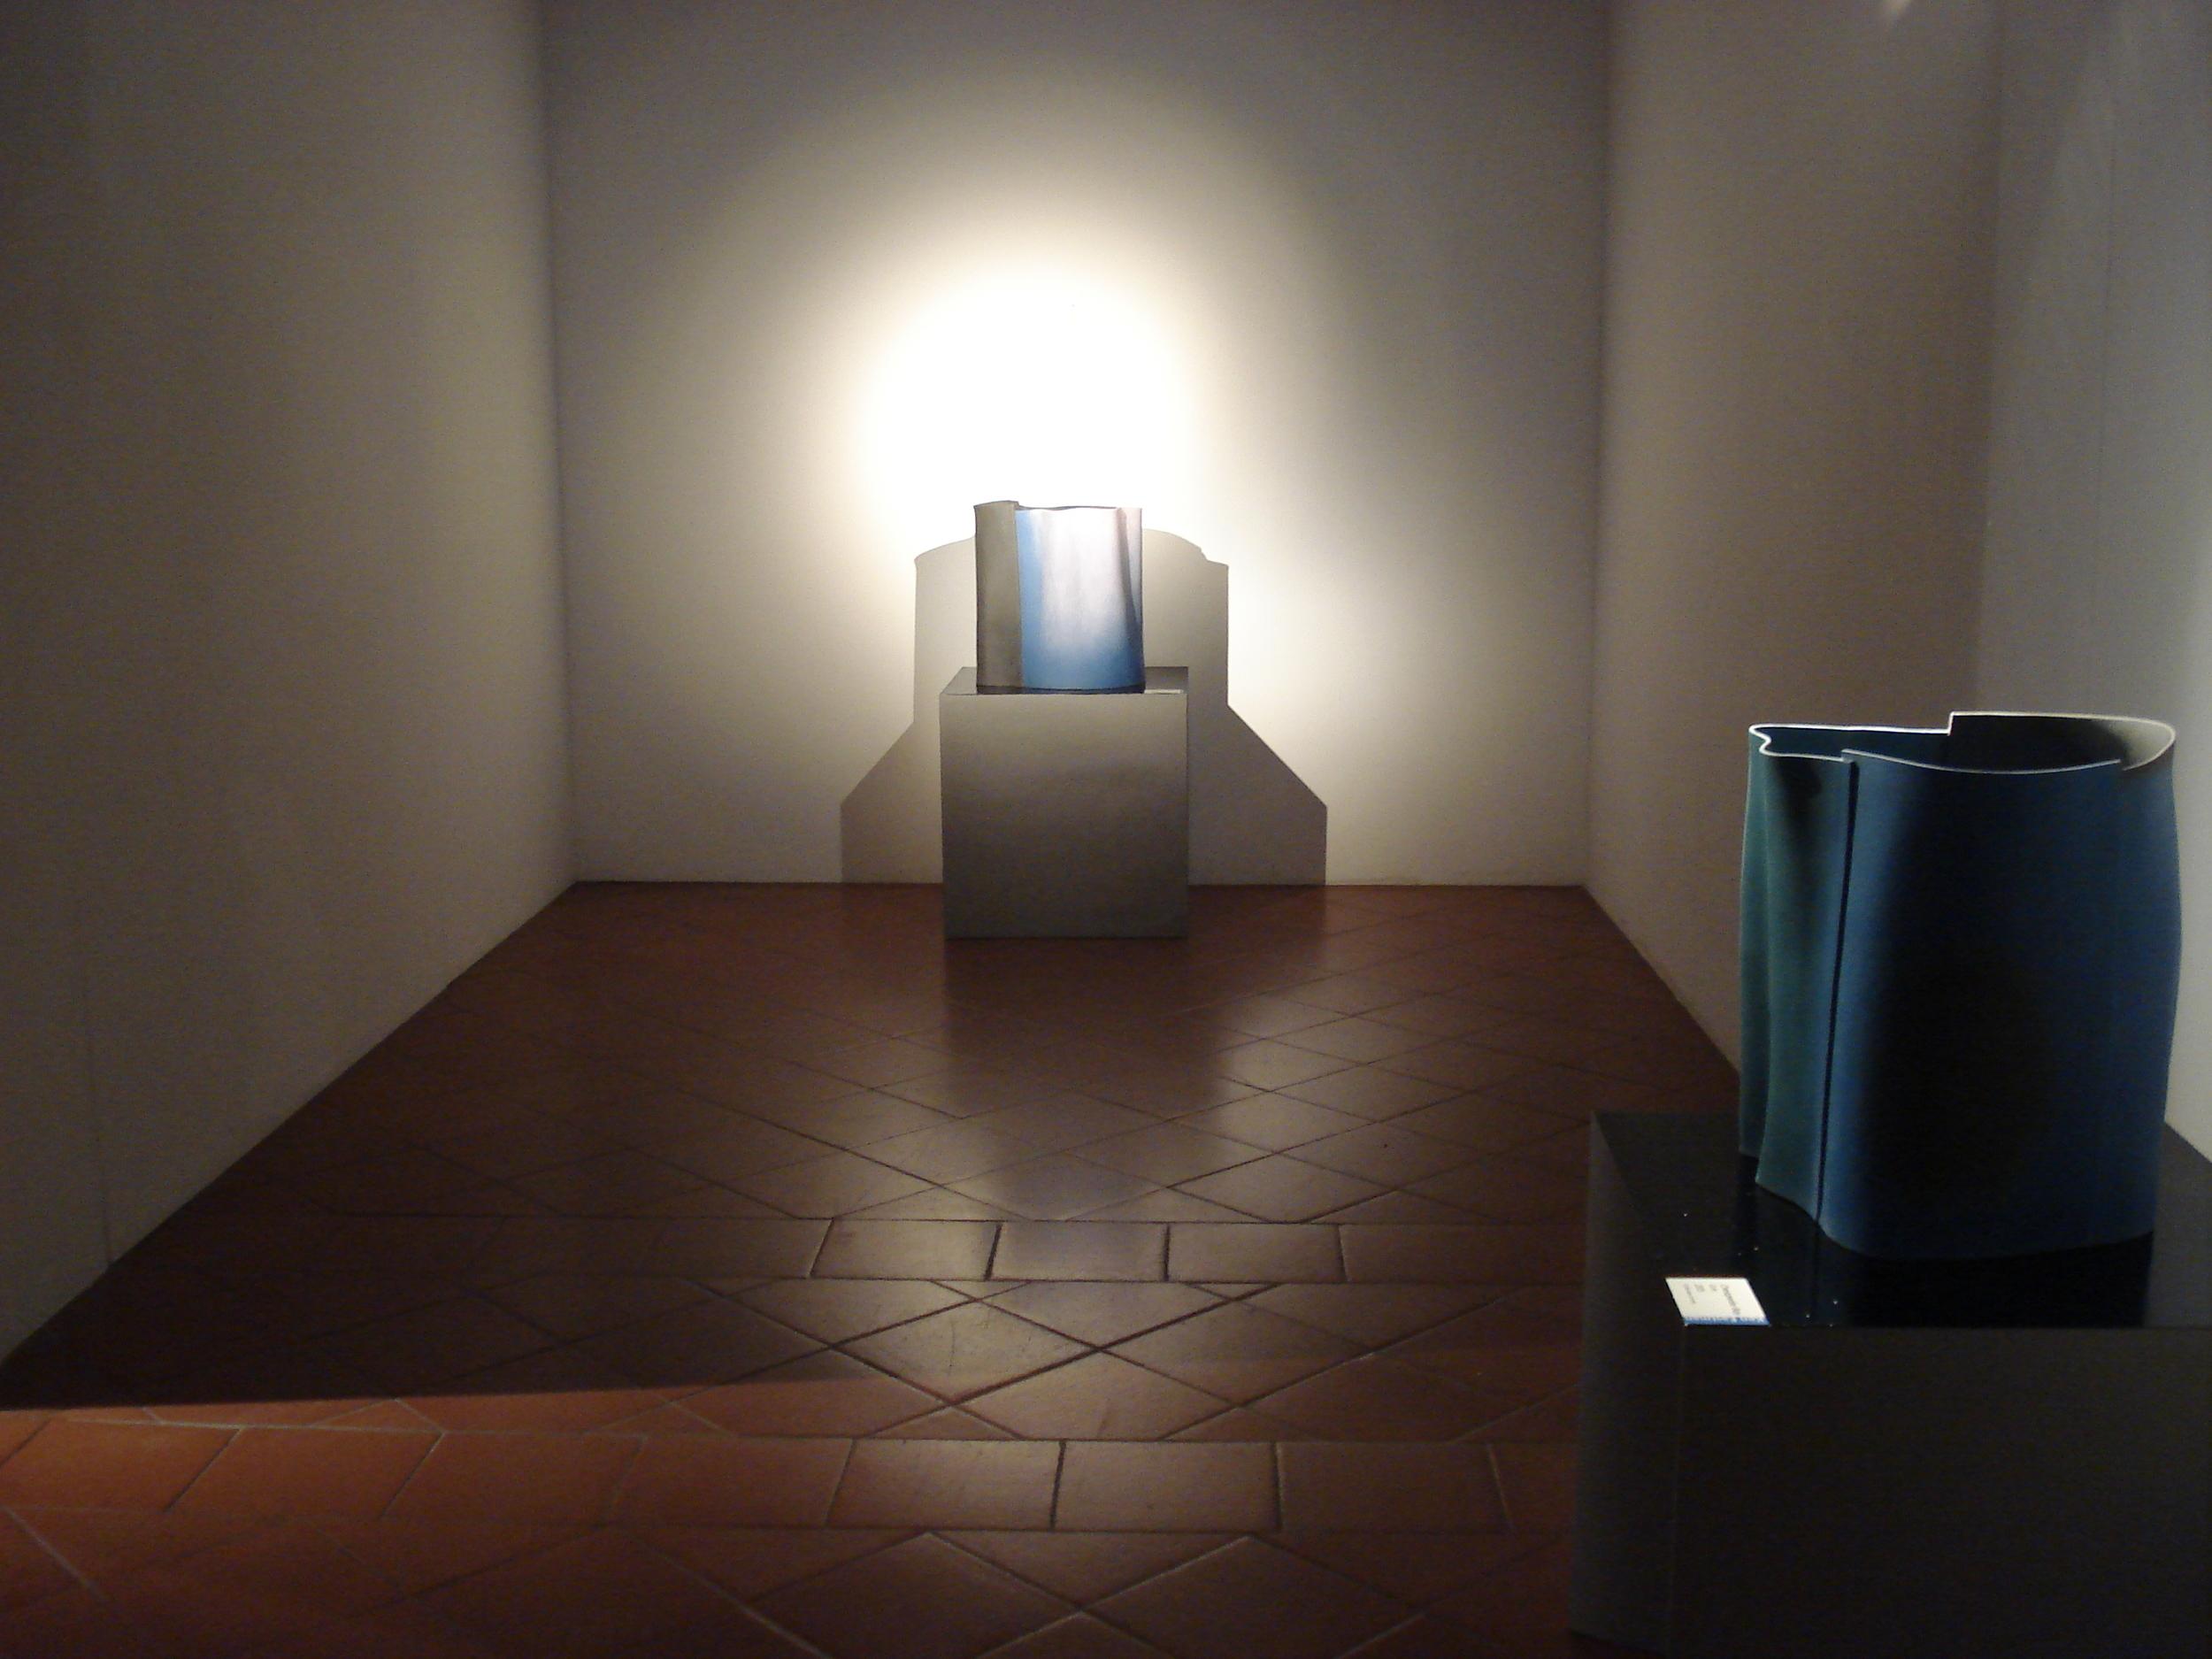 'I maestri del concorso' International Museum of Ceramics Faenza, Italy 2009